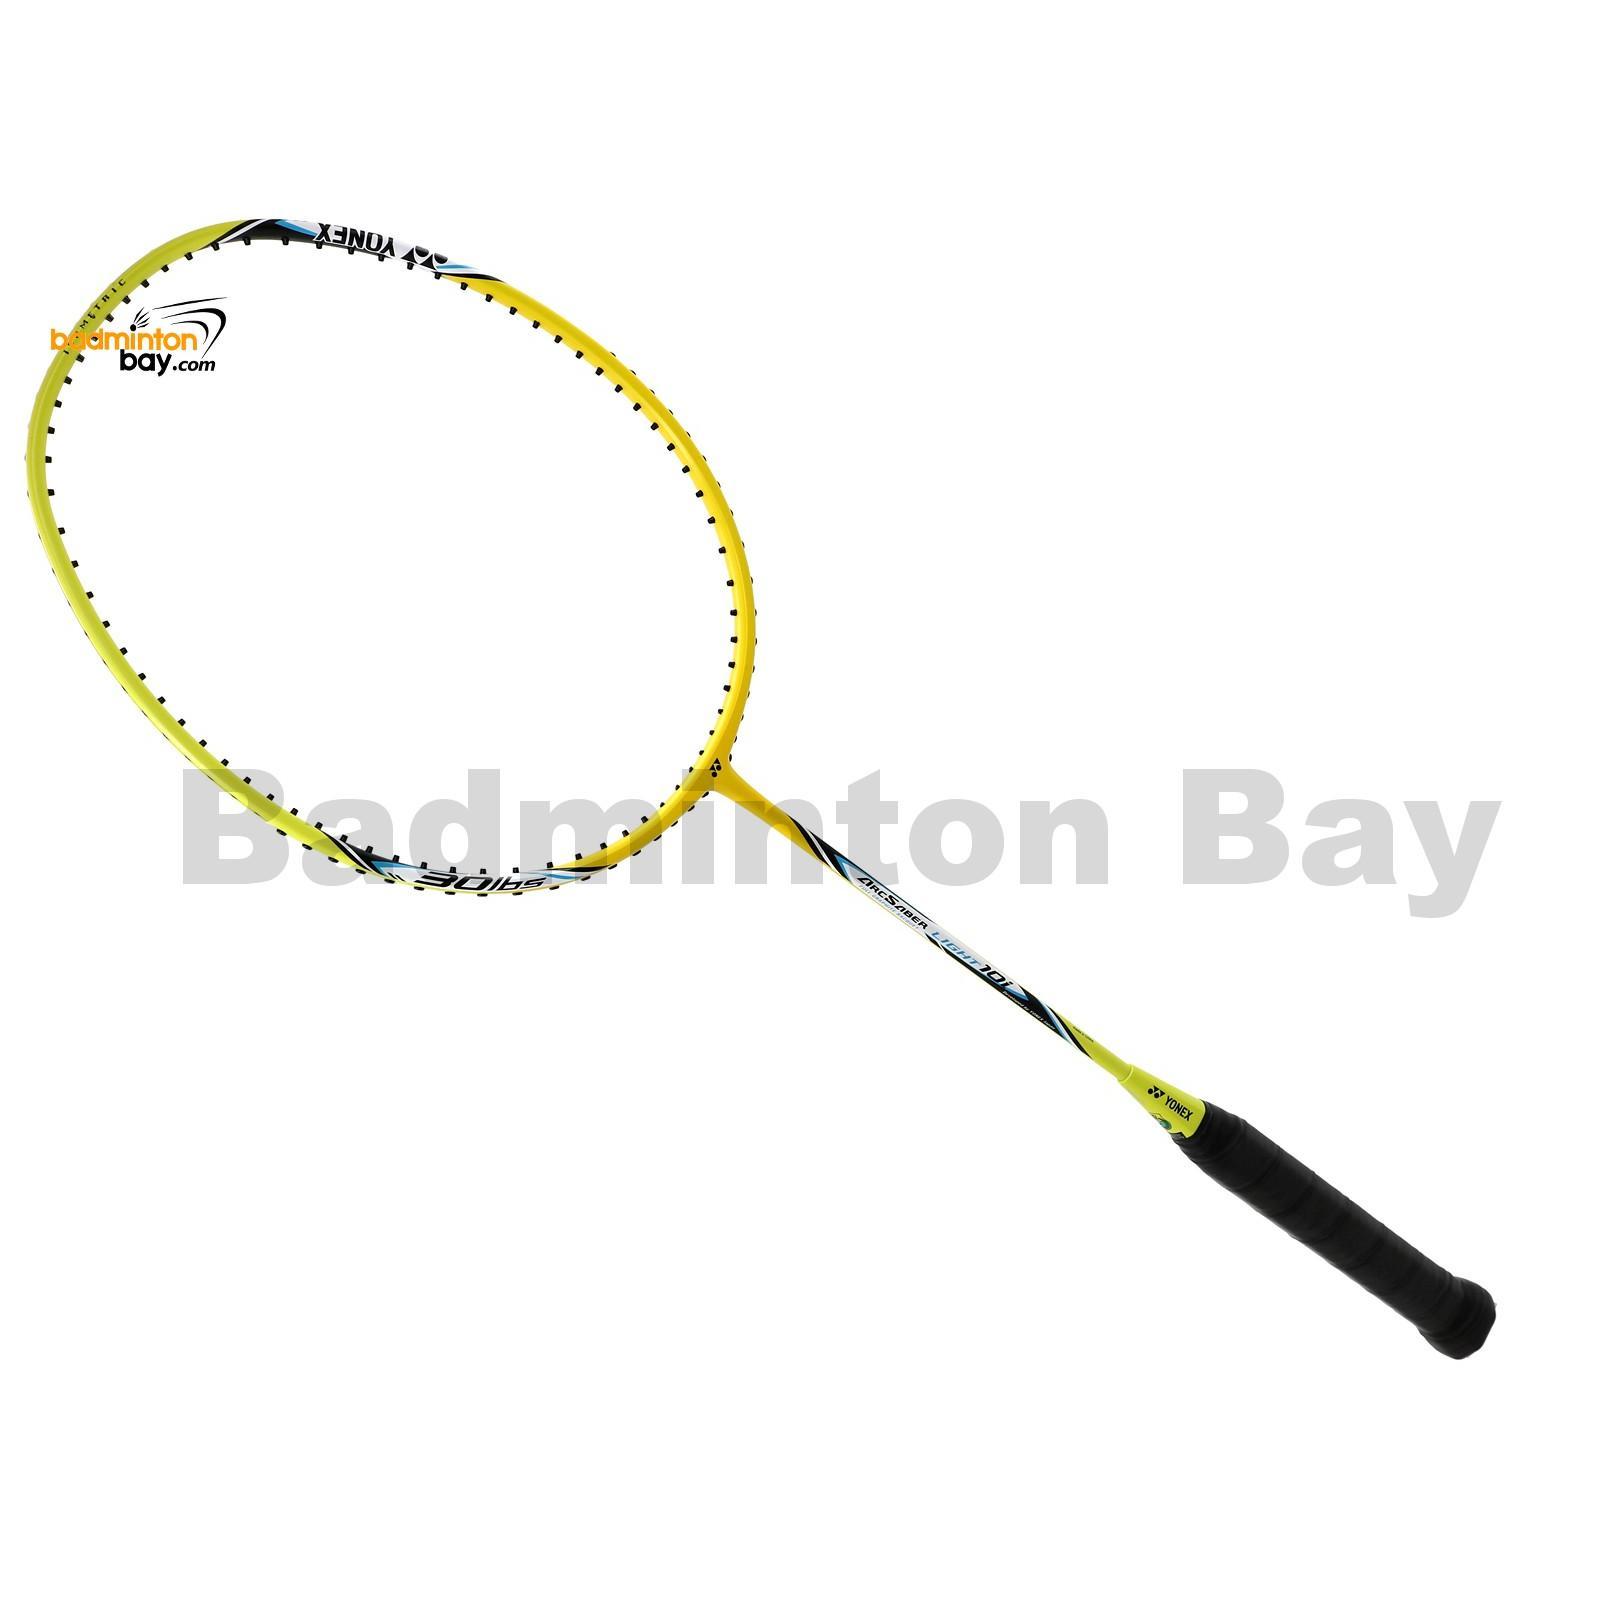 Badminton Popular Brand Yonex Arcsaber 2 Tour 3u4 Red Badminton Racquet With New Bg65@26 Tennis & Racquet Sports